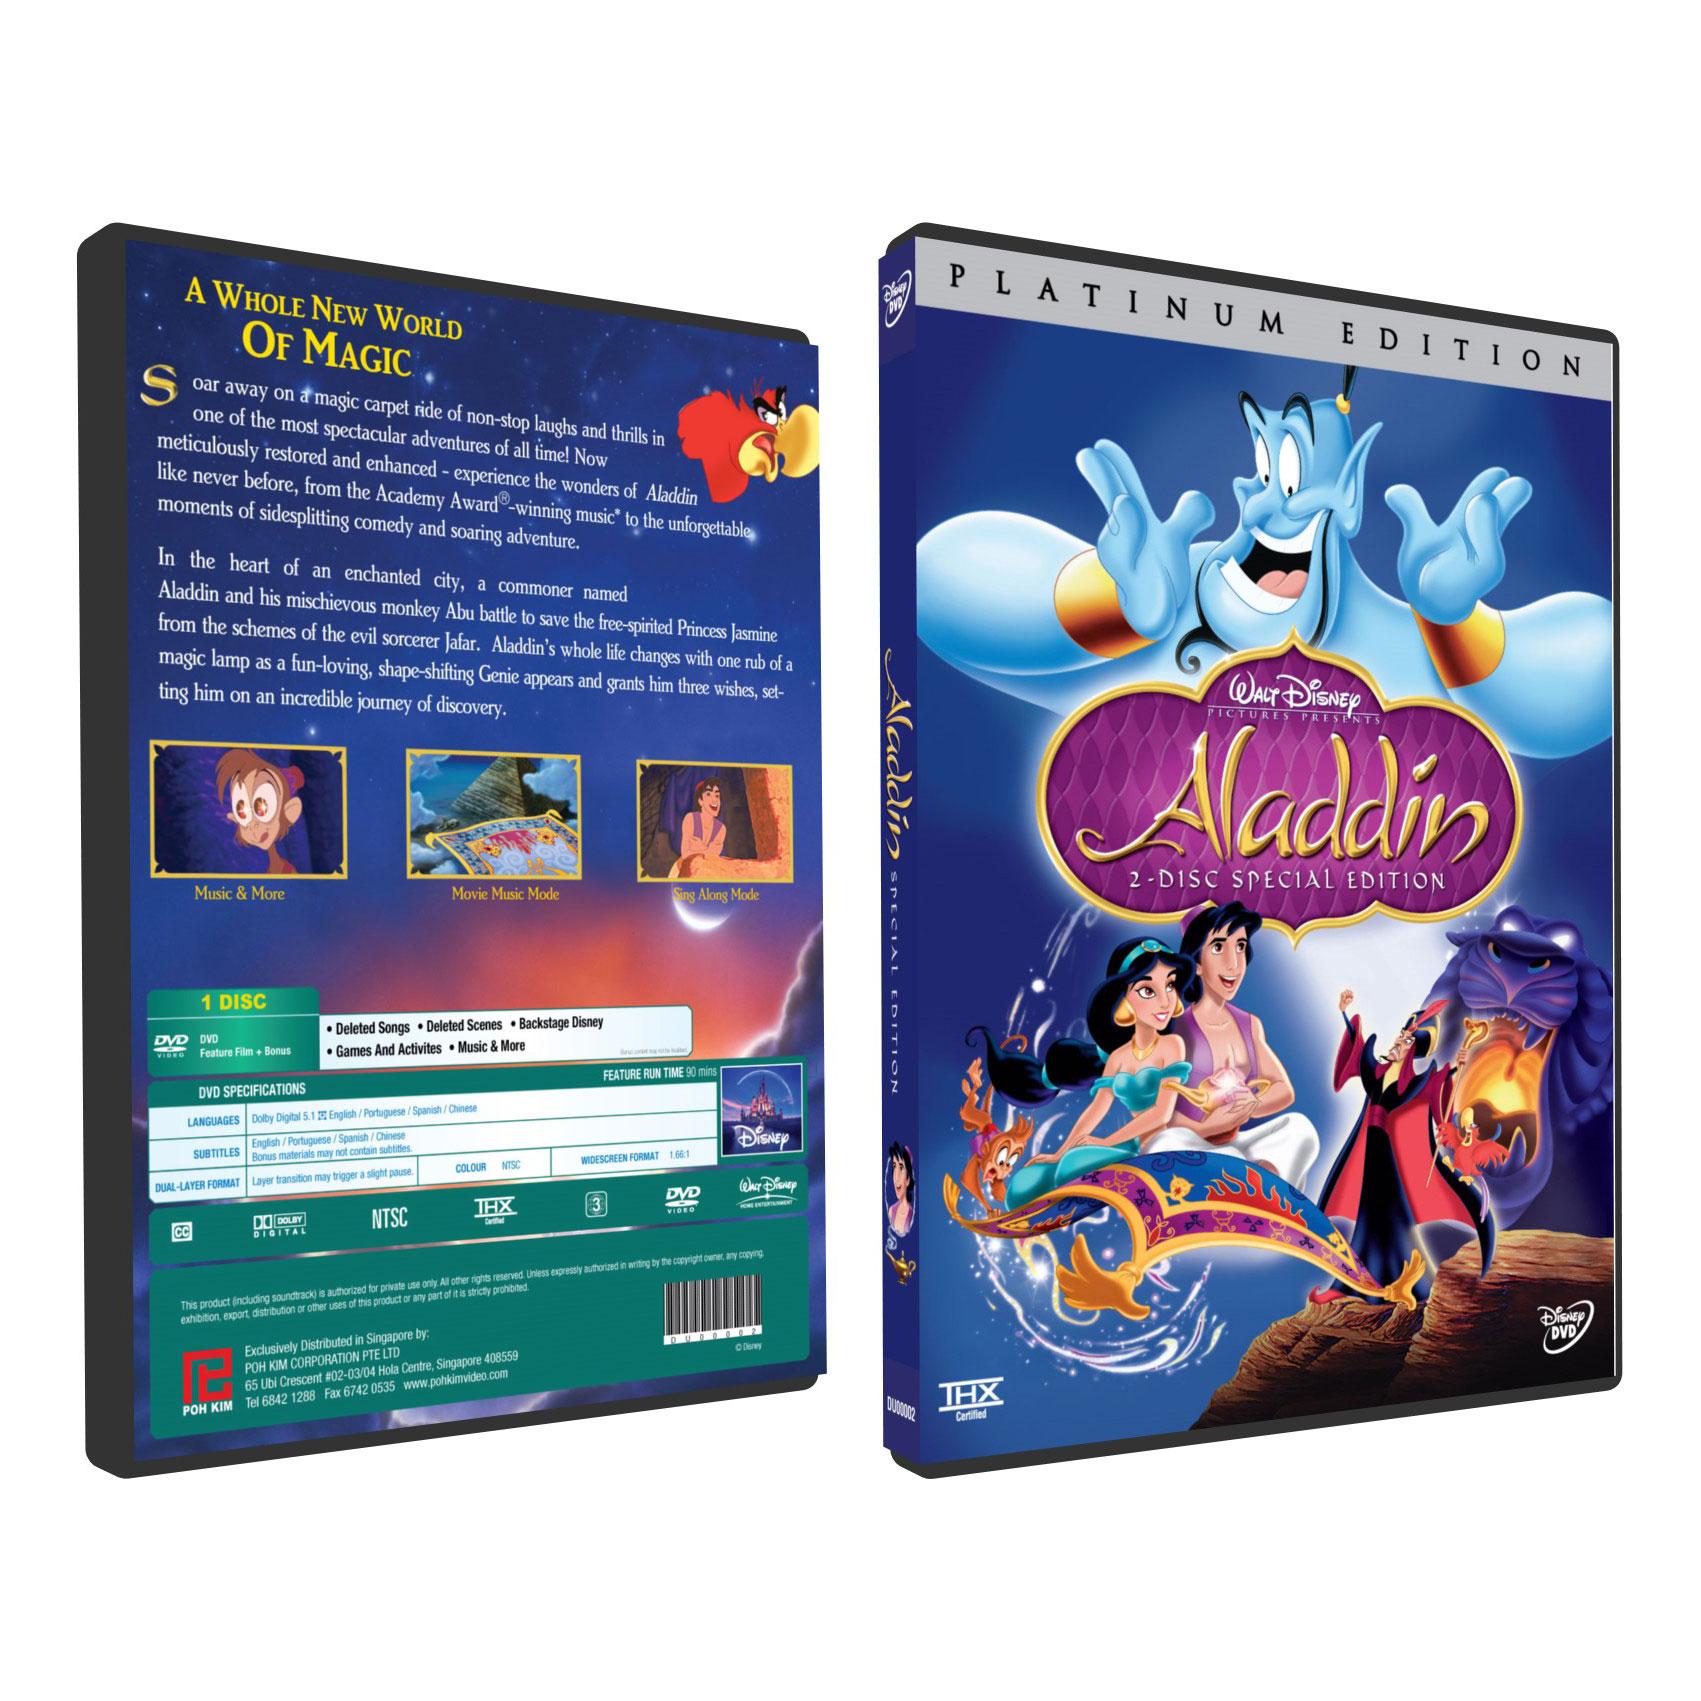 Edition Platinum: Aladdin (Platinum Edition) (DVD)